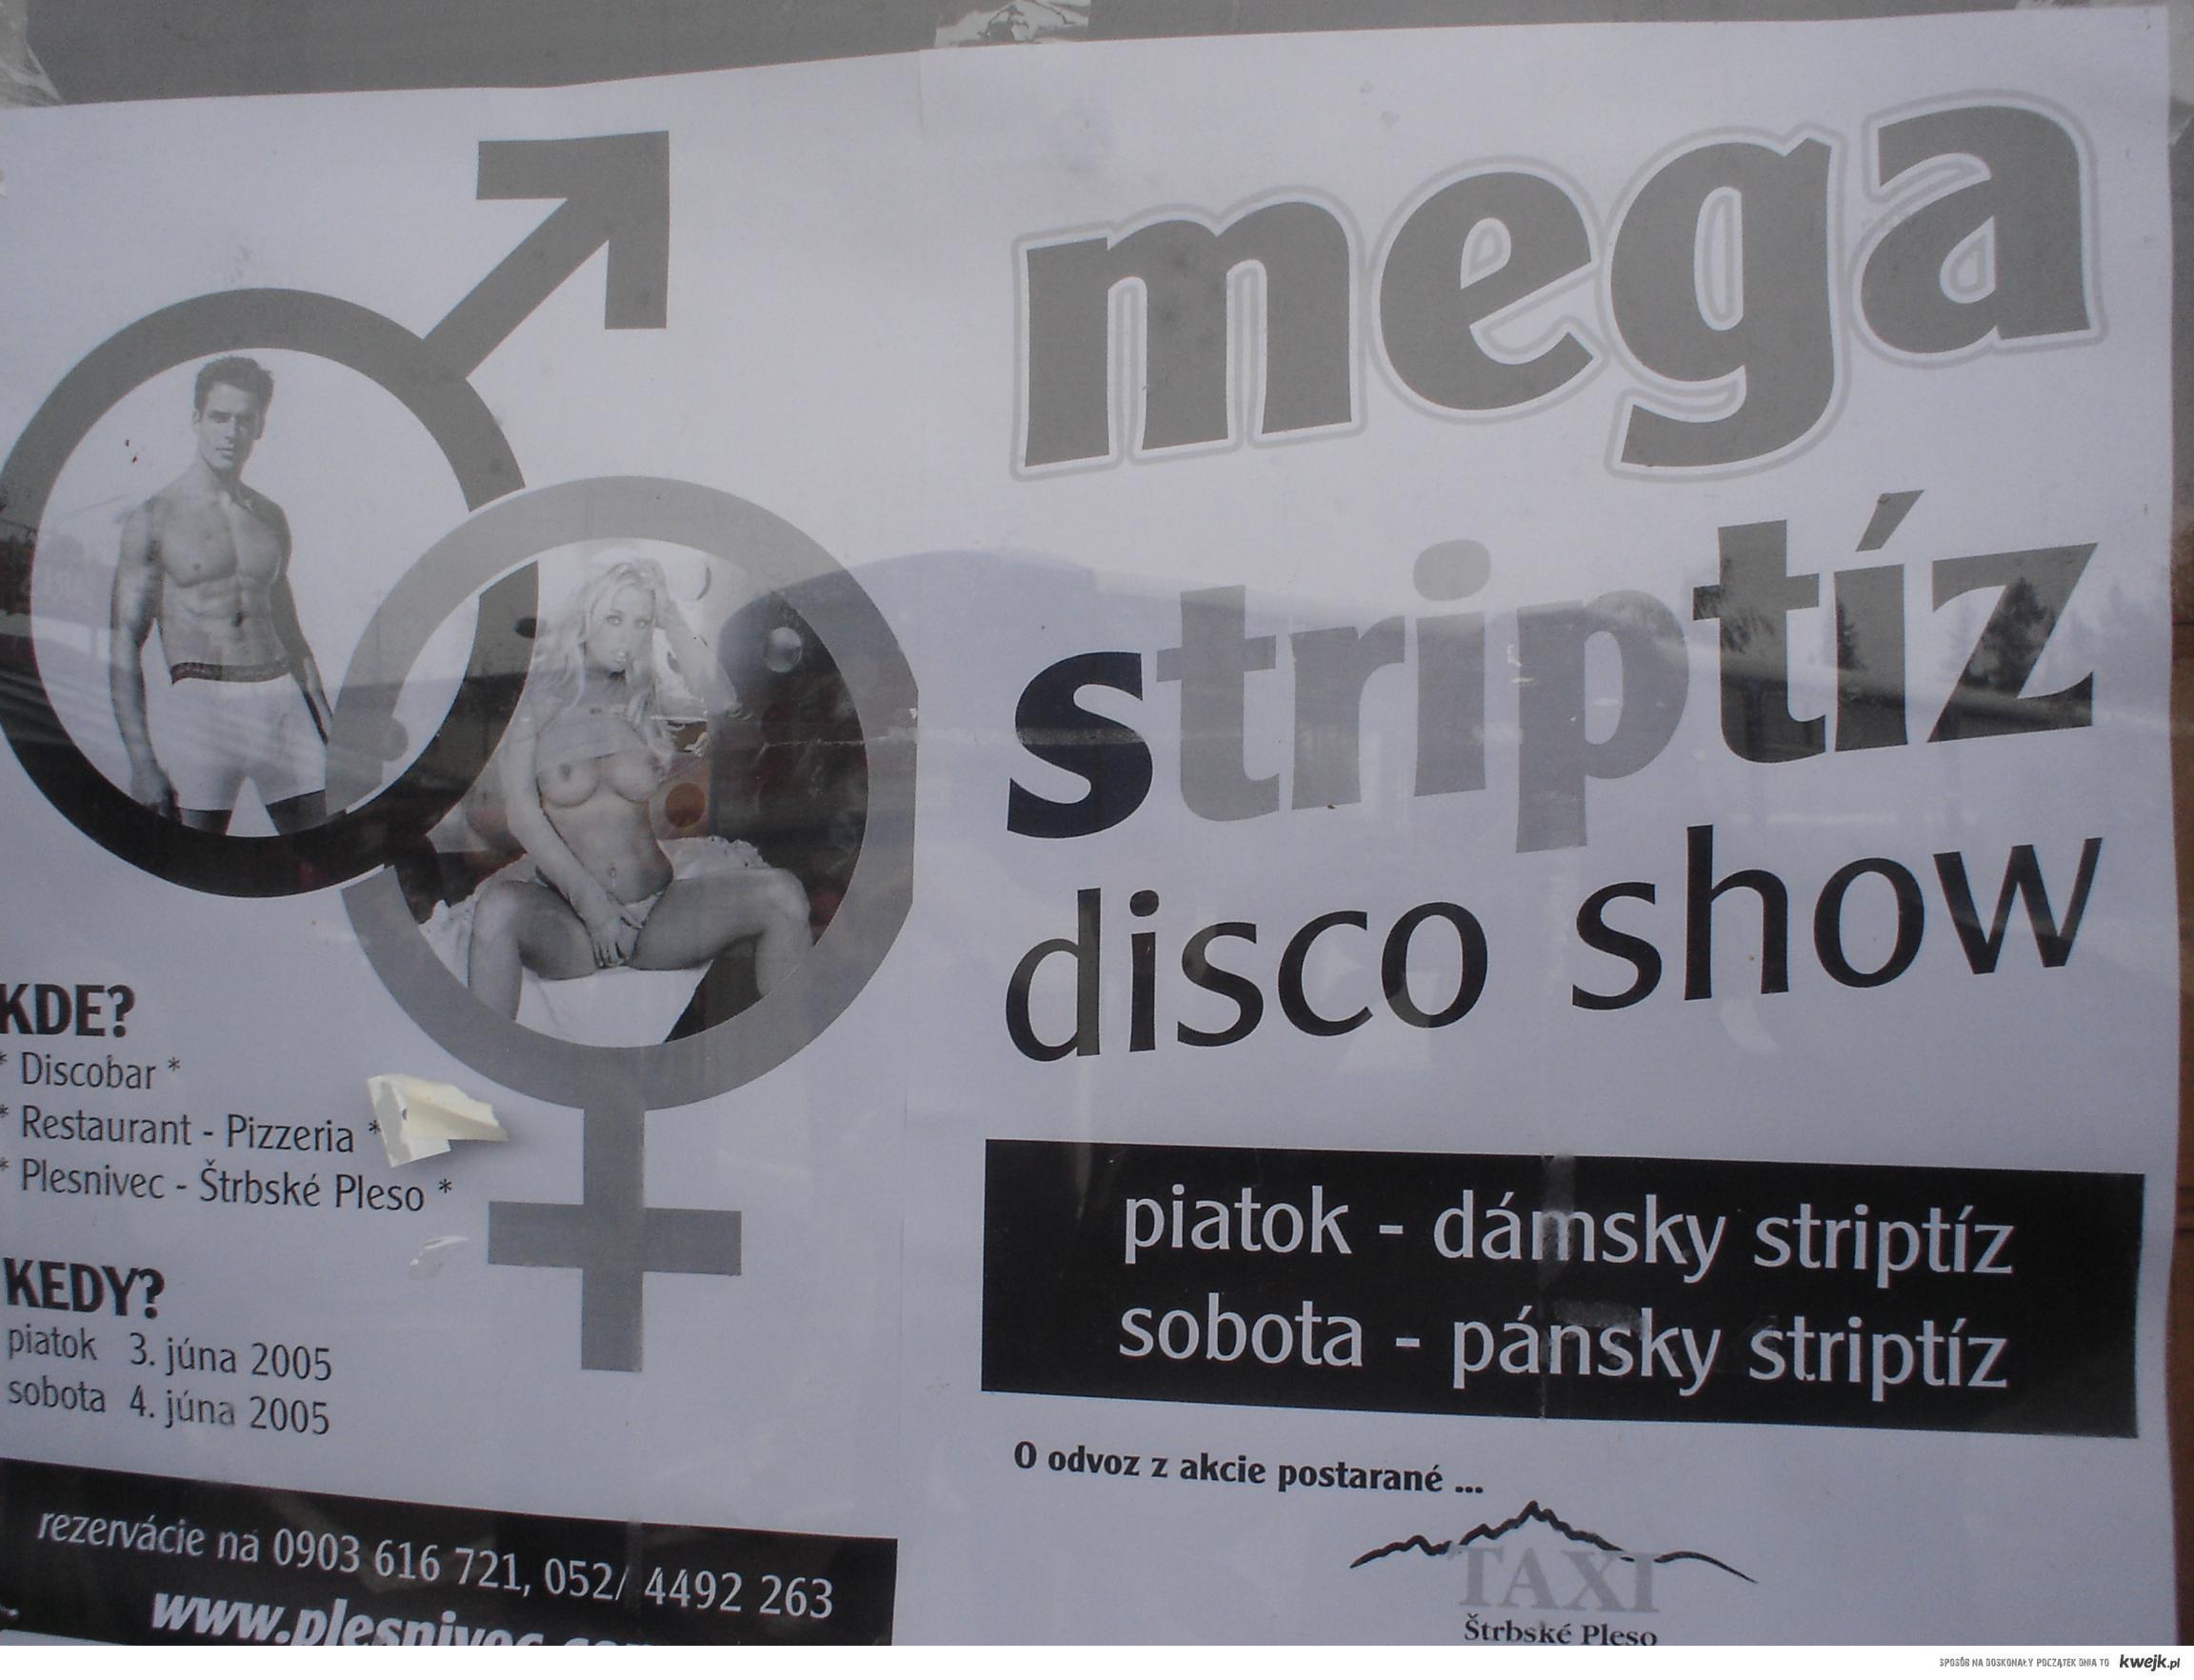 Pański striptiz?